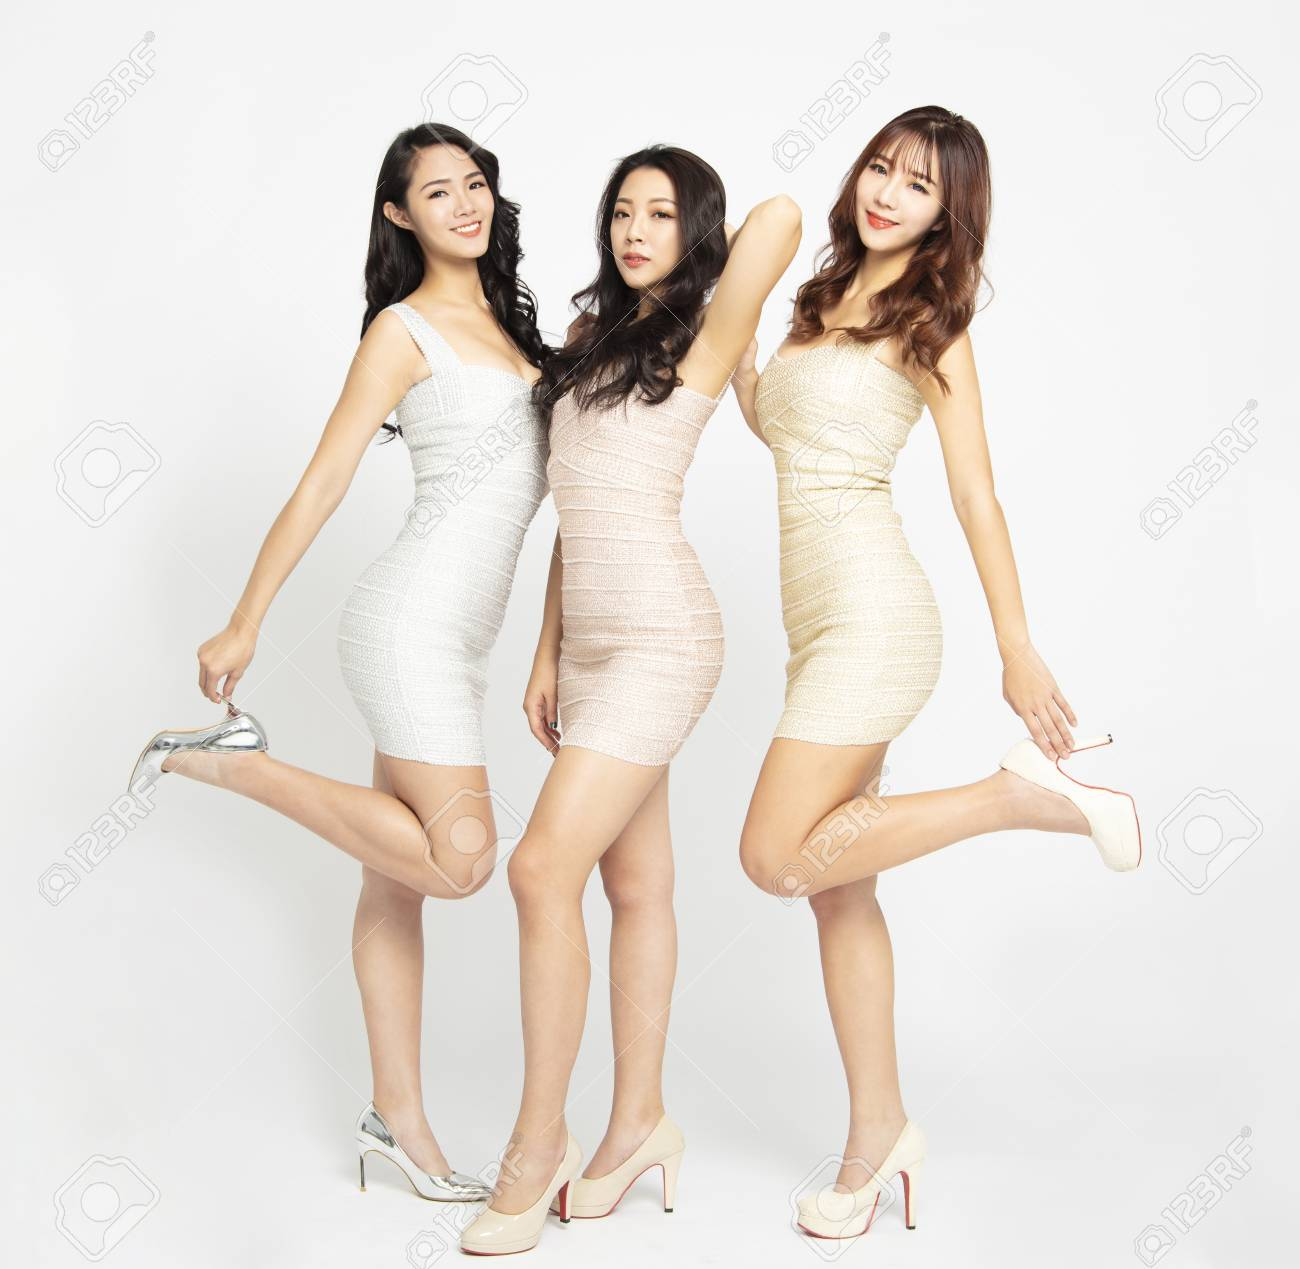 full length of beautiful asian young woman group - 116493300